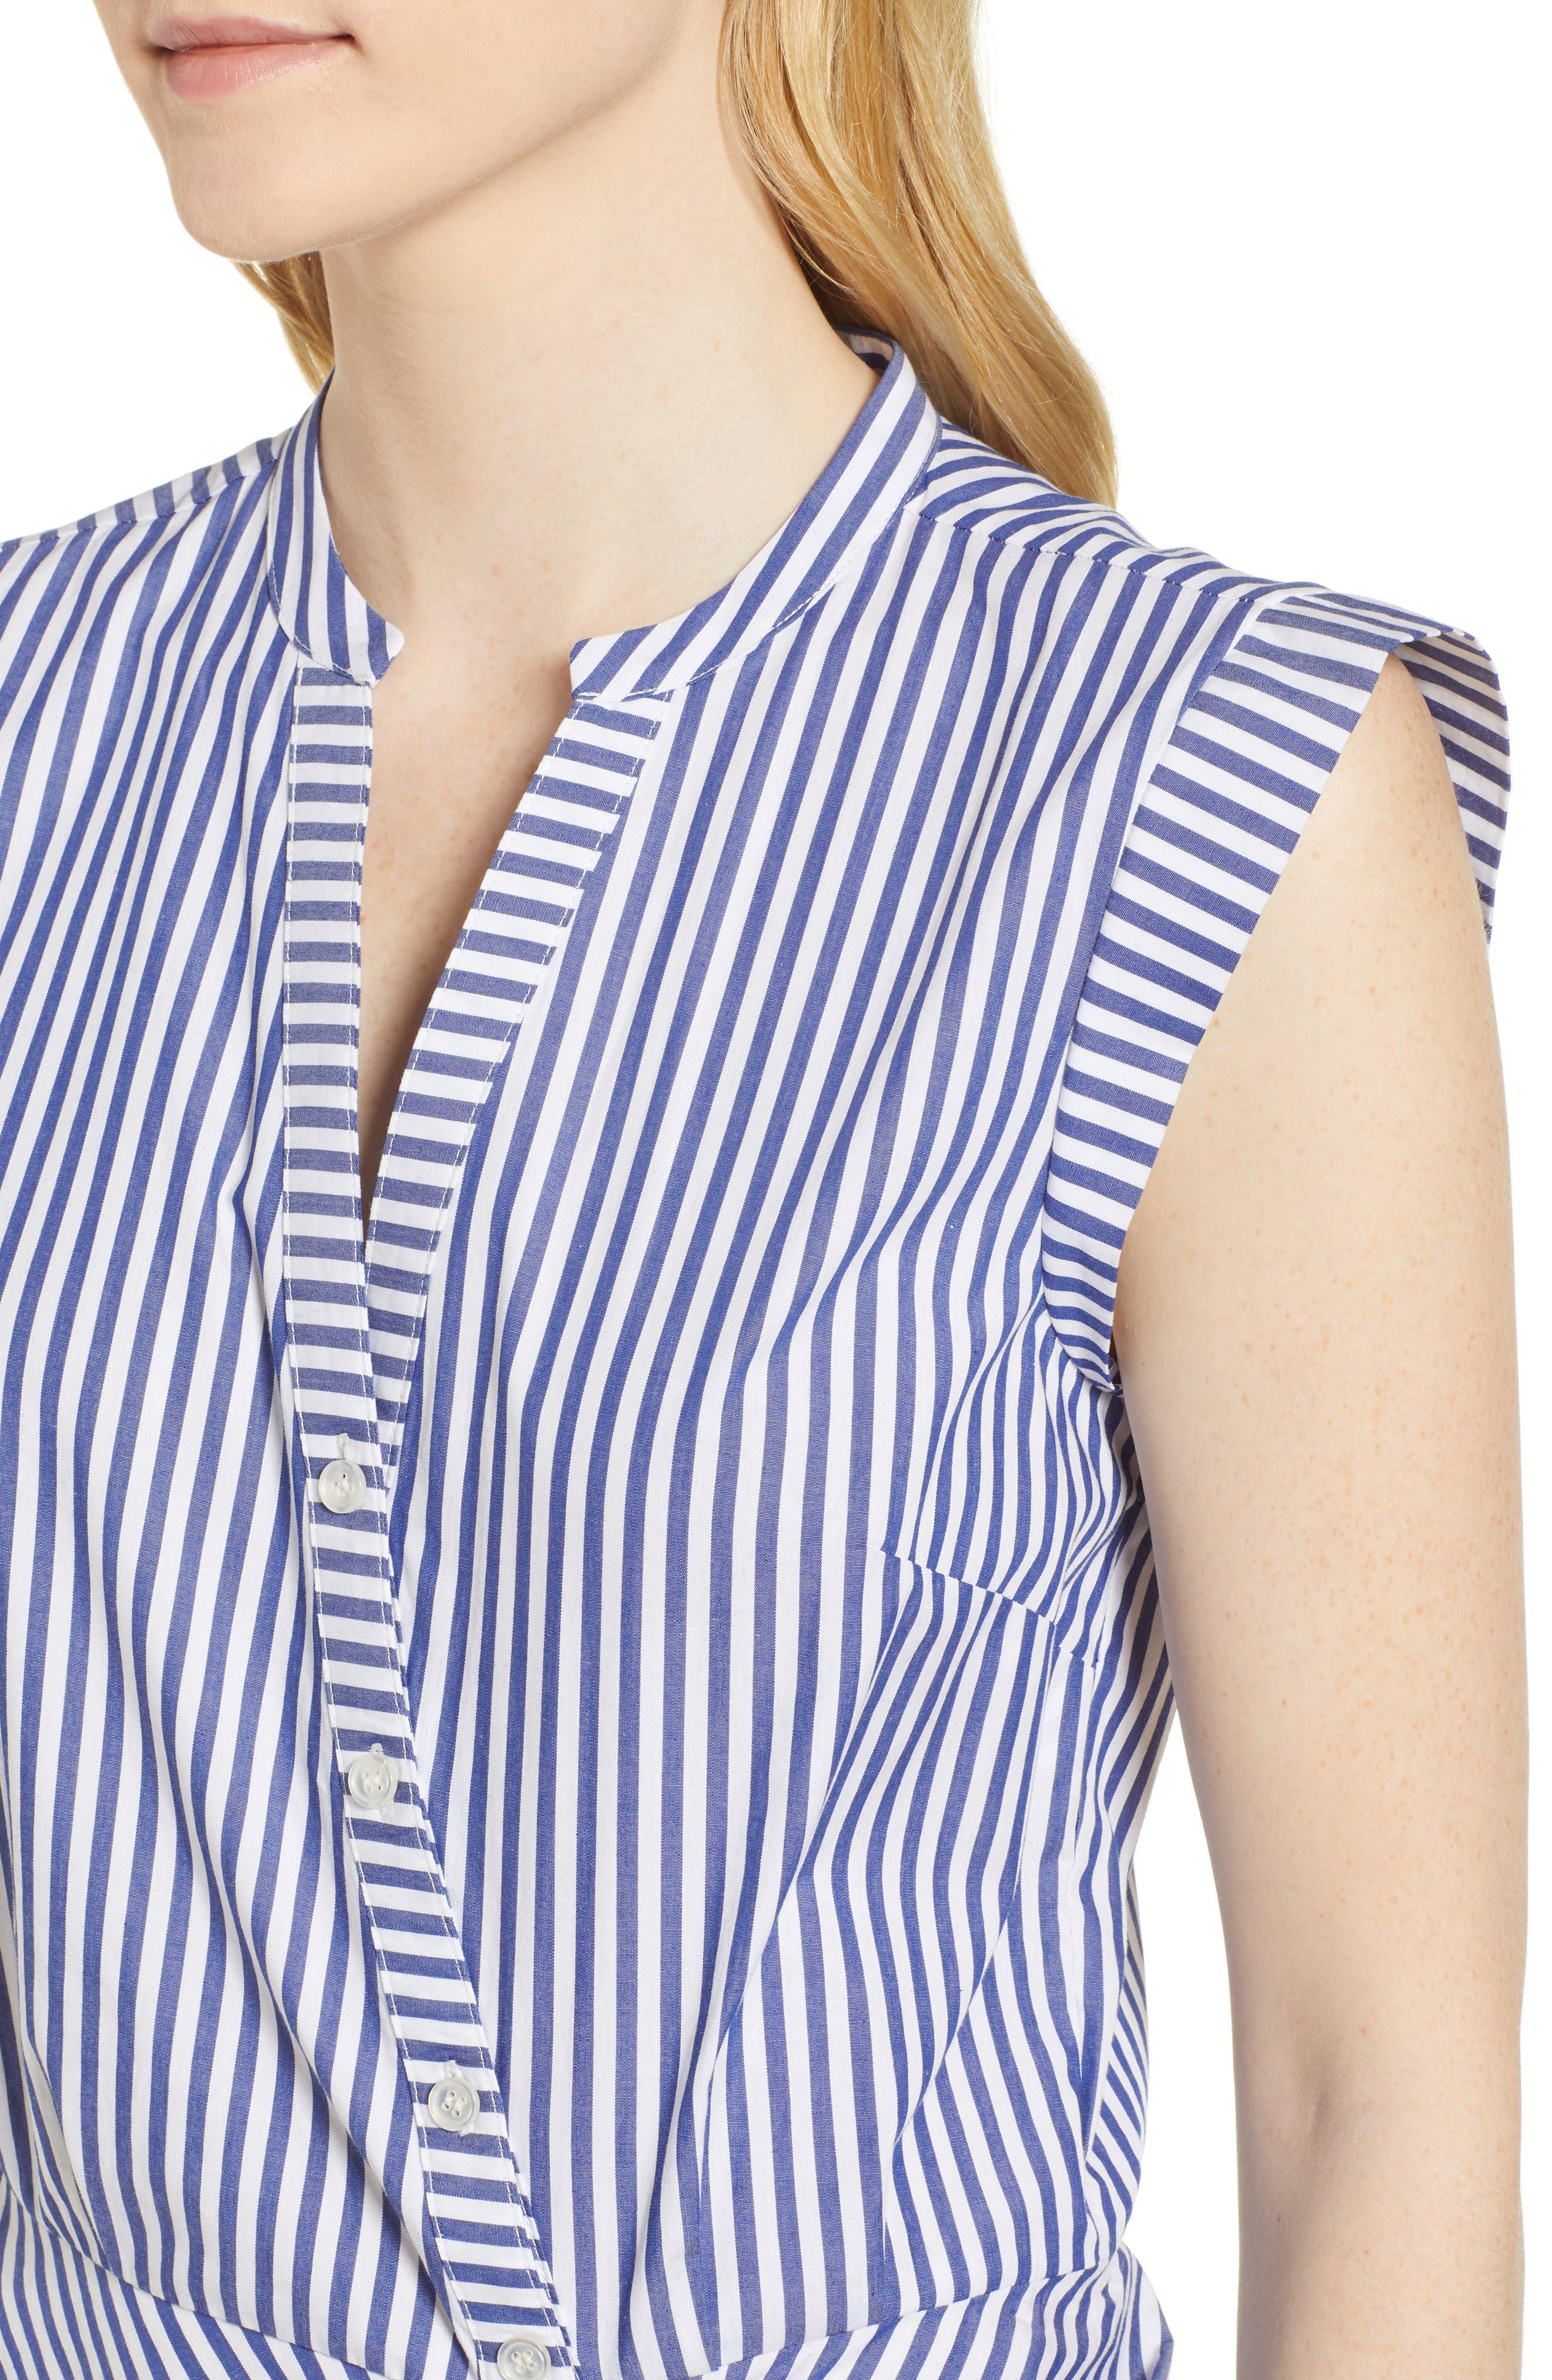 Stripe Ruched Cotton Shirtdress,                             Alternate thumbnail 11, color,                             Blue White Stripe